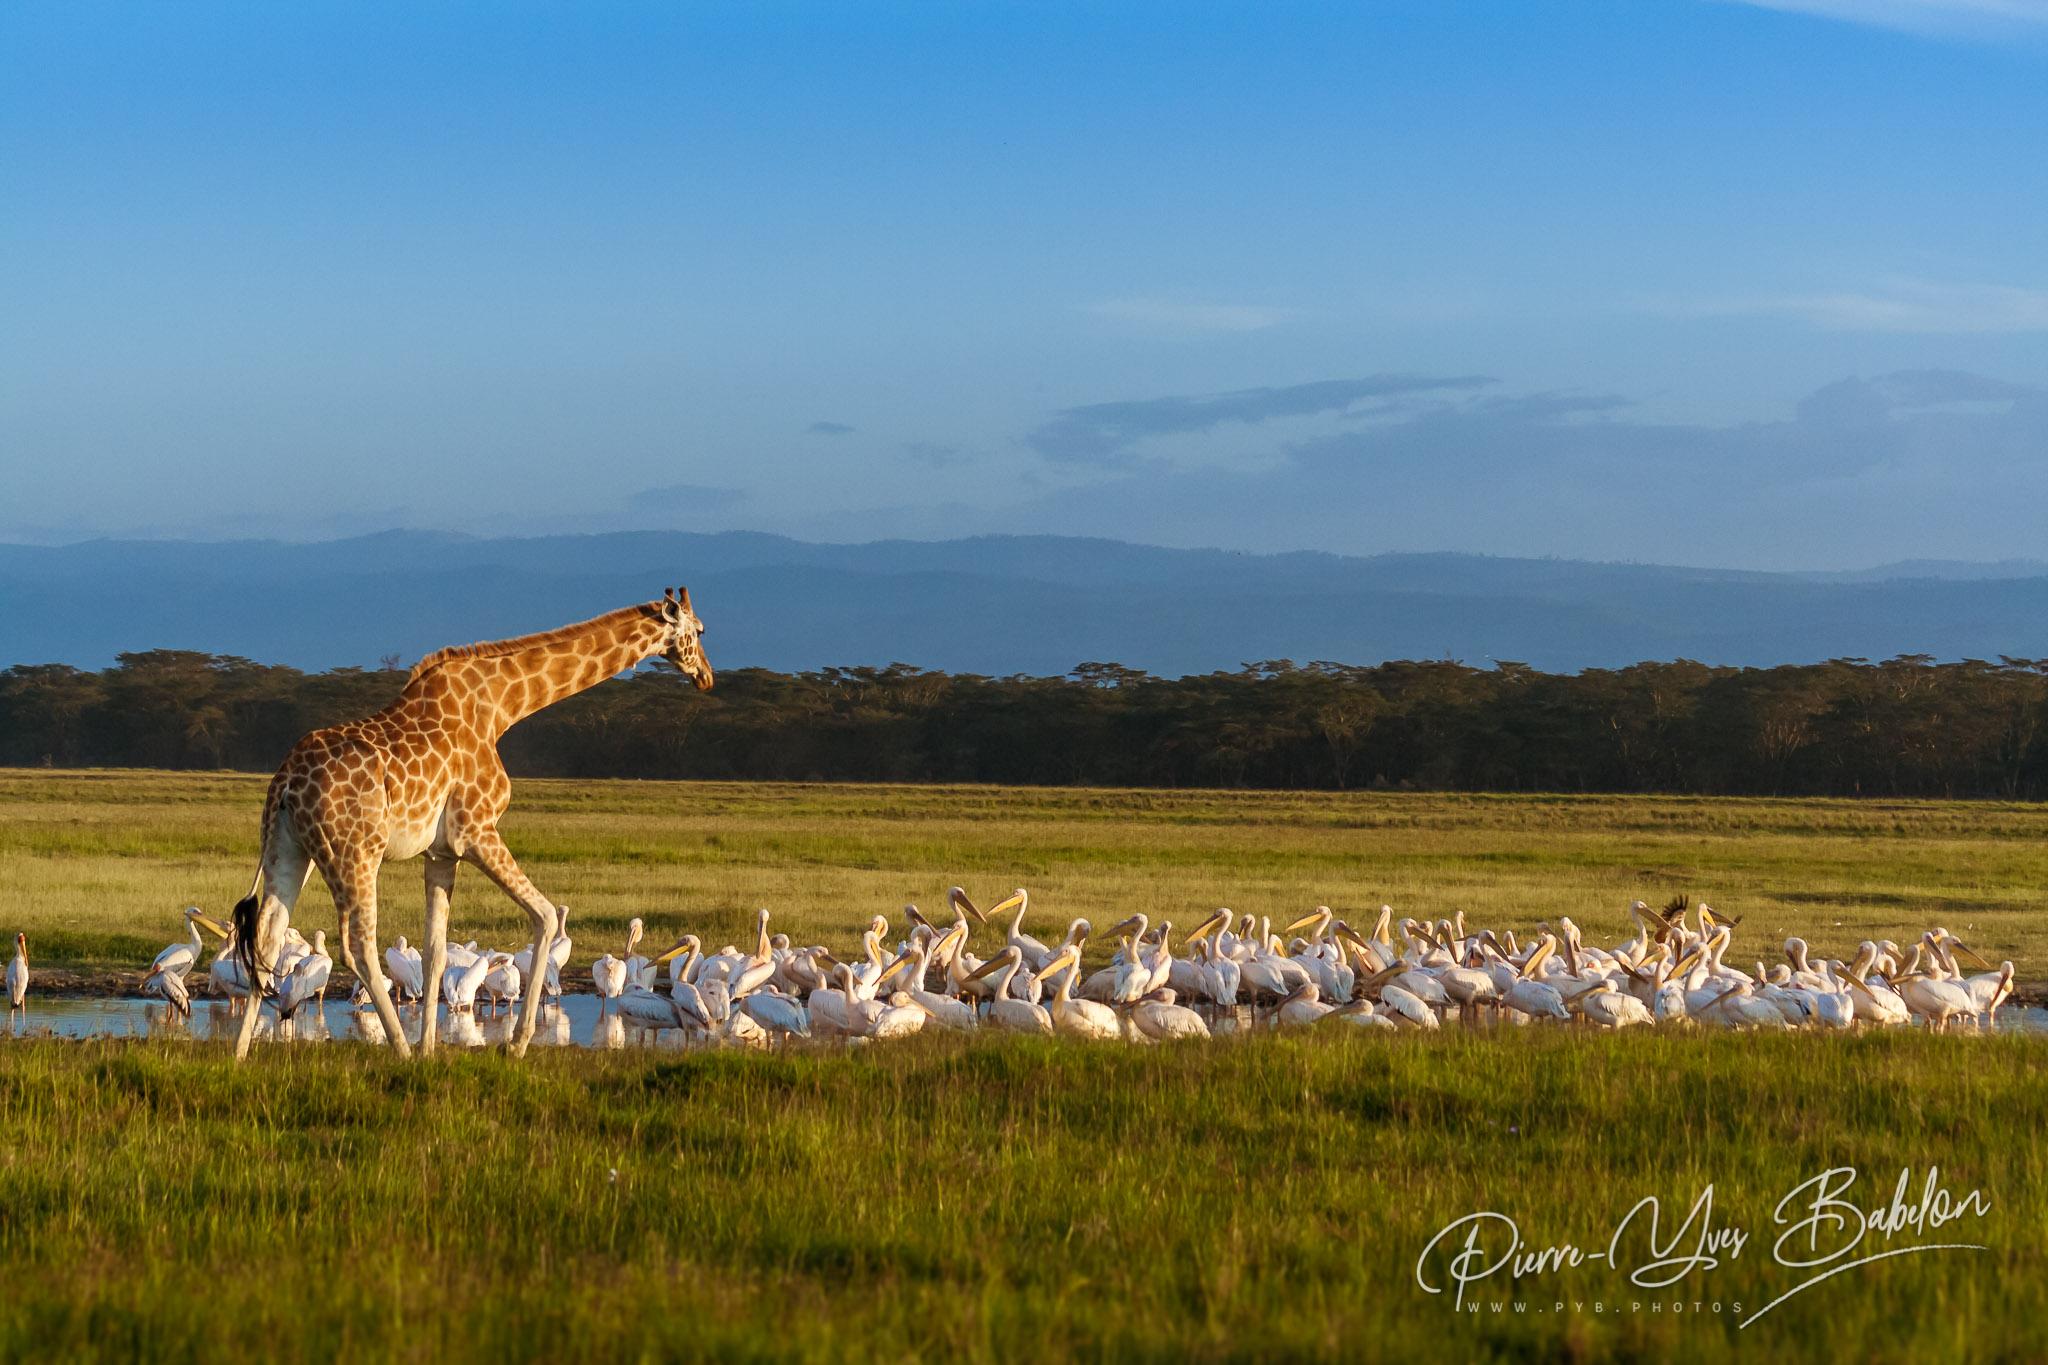 Rothschild's Giraffe (Giraffa camelopardalis) and pelicans